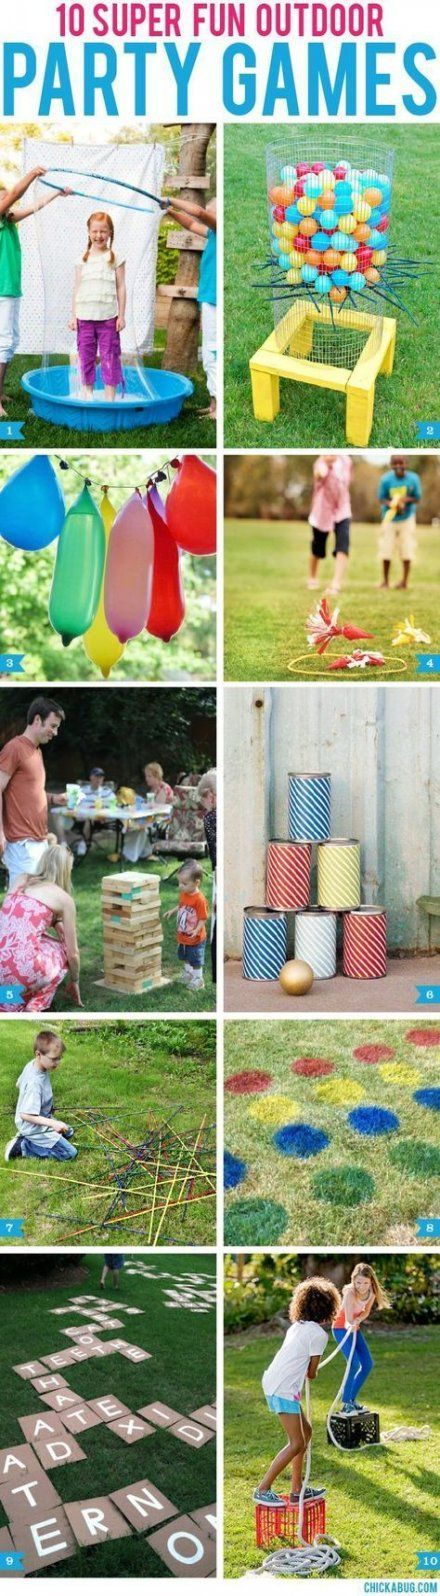 Best Backyard Party Games Adults Hula Hoop 62 Ideas